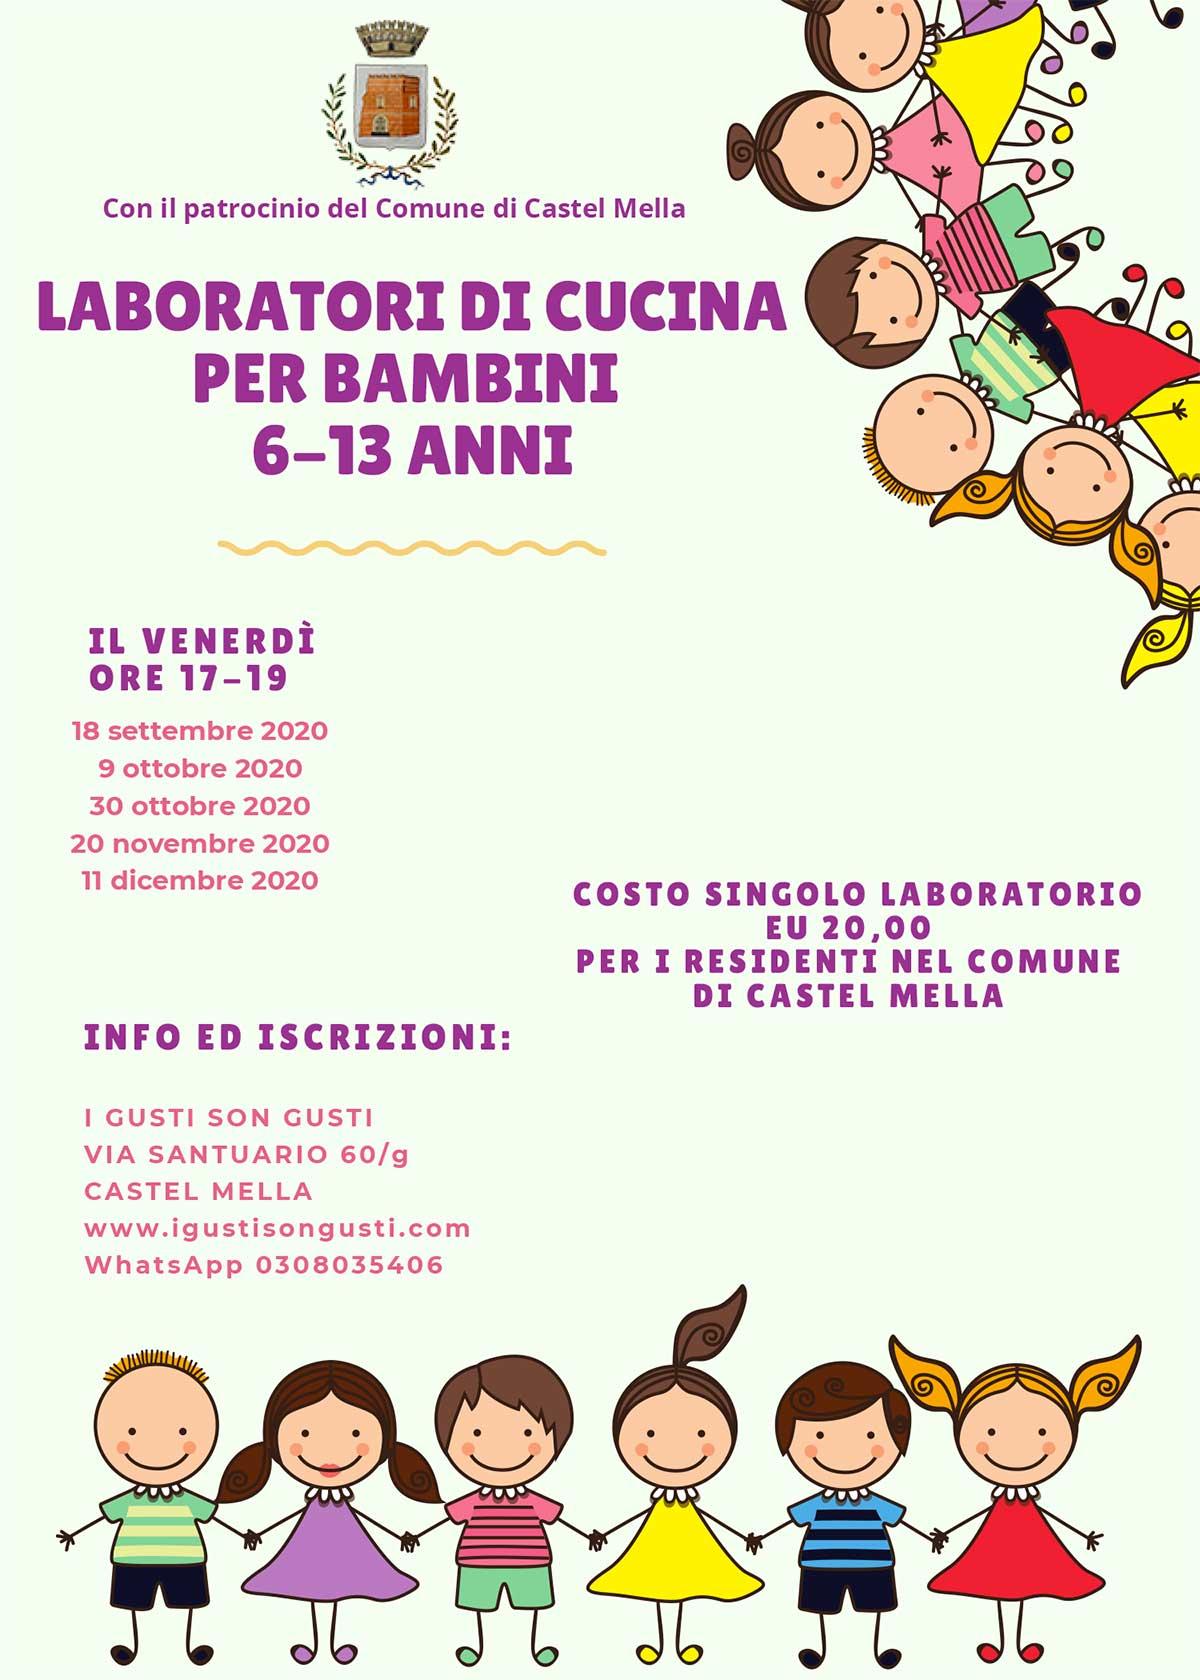 lab_cucina-bambini_castel_mella